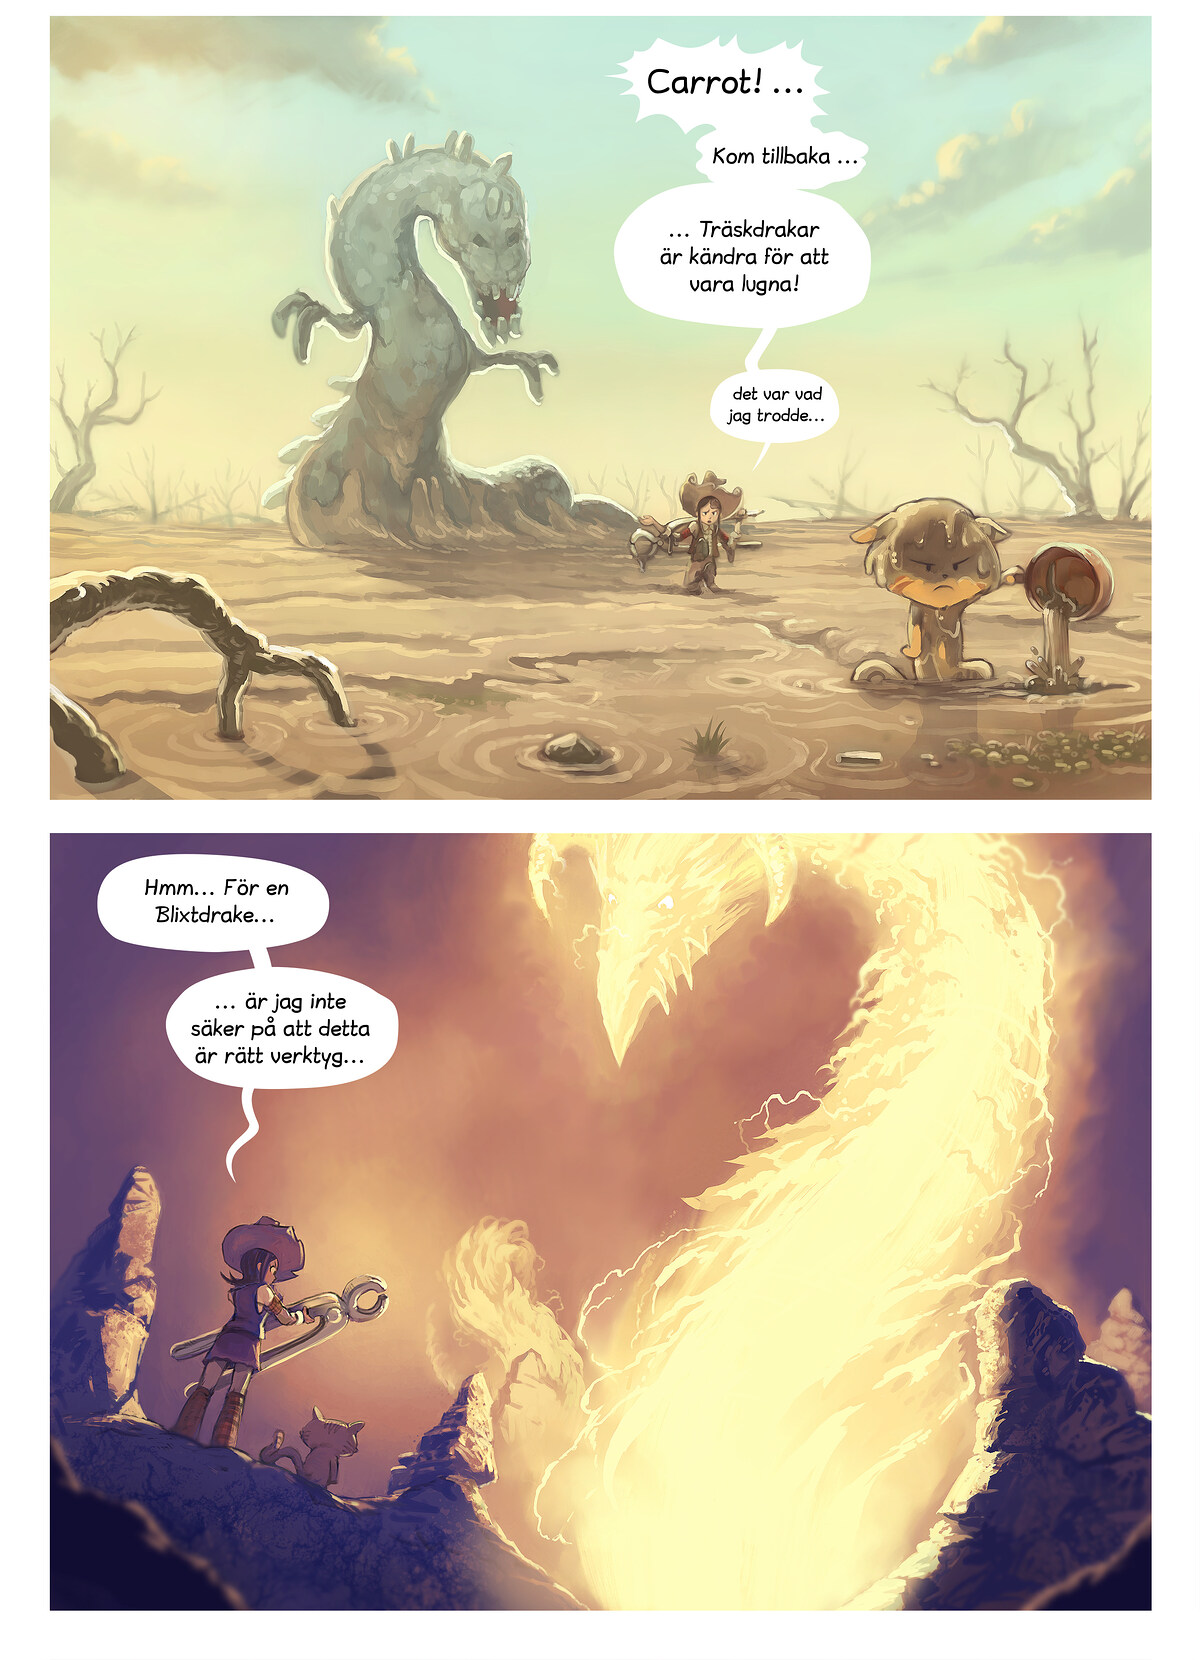 Episode 14: Draktanden, Page 4